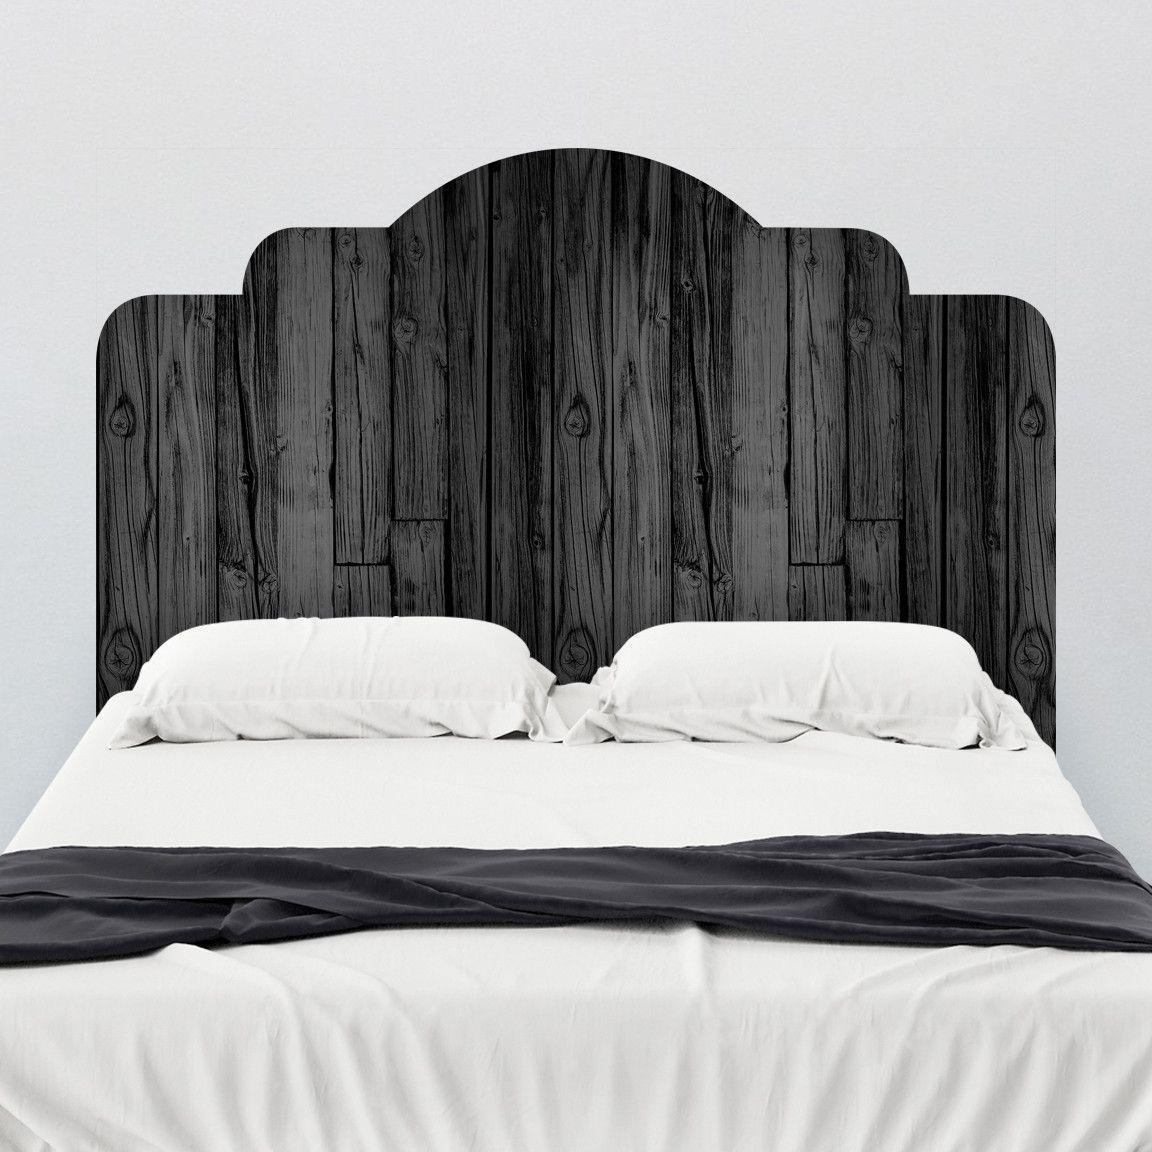 Black Stained Wood Adhesive Headboard Wall Decal Wallsneedlove